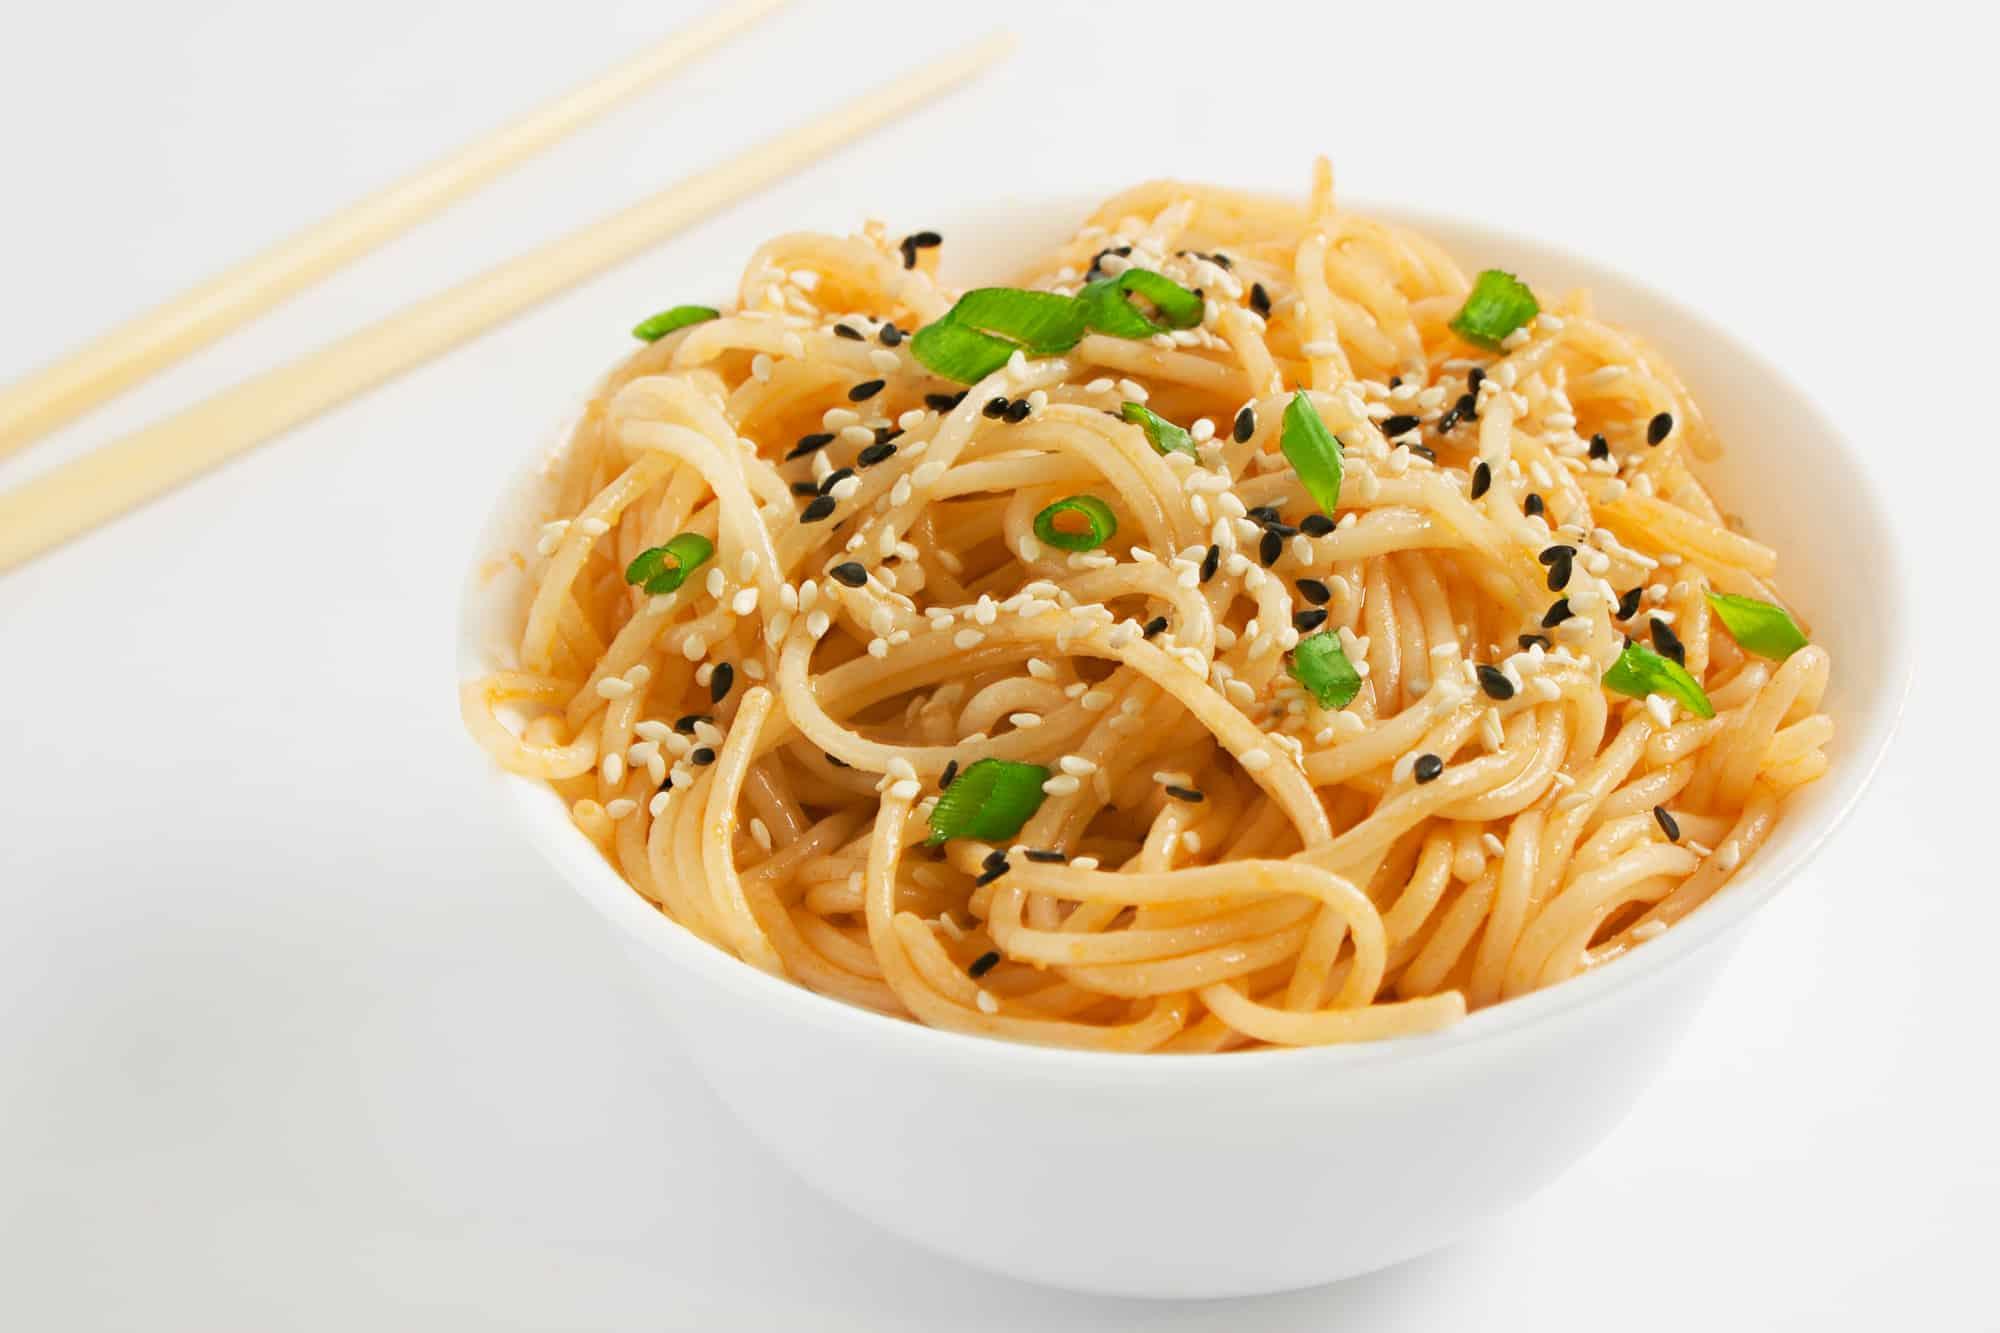 screenshot of non perishable meal idea - cold spicy peanut sesame noodles